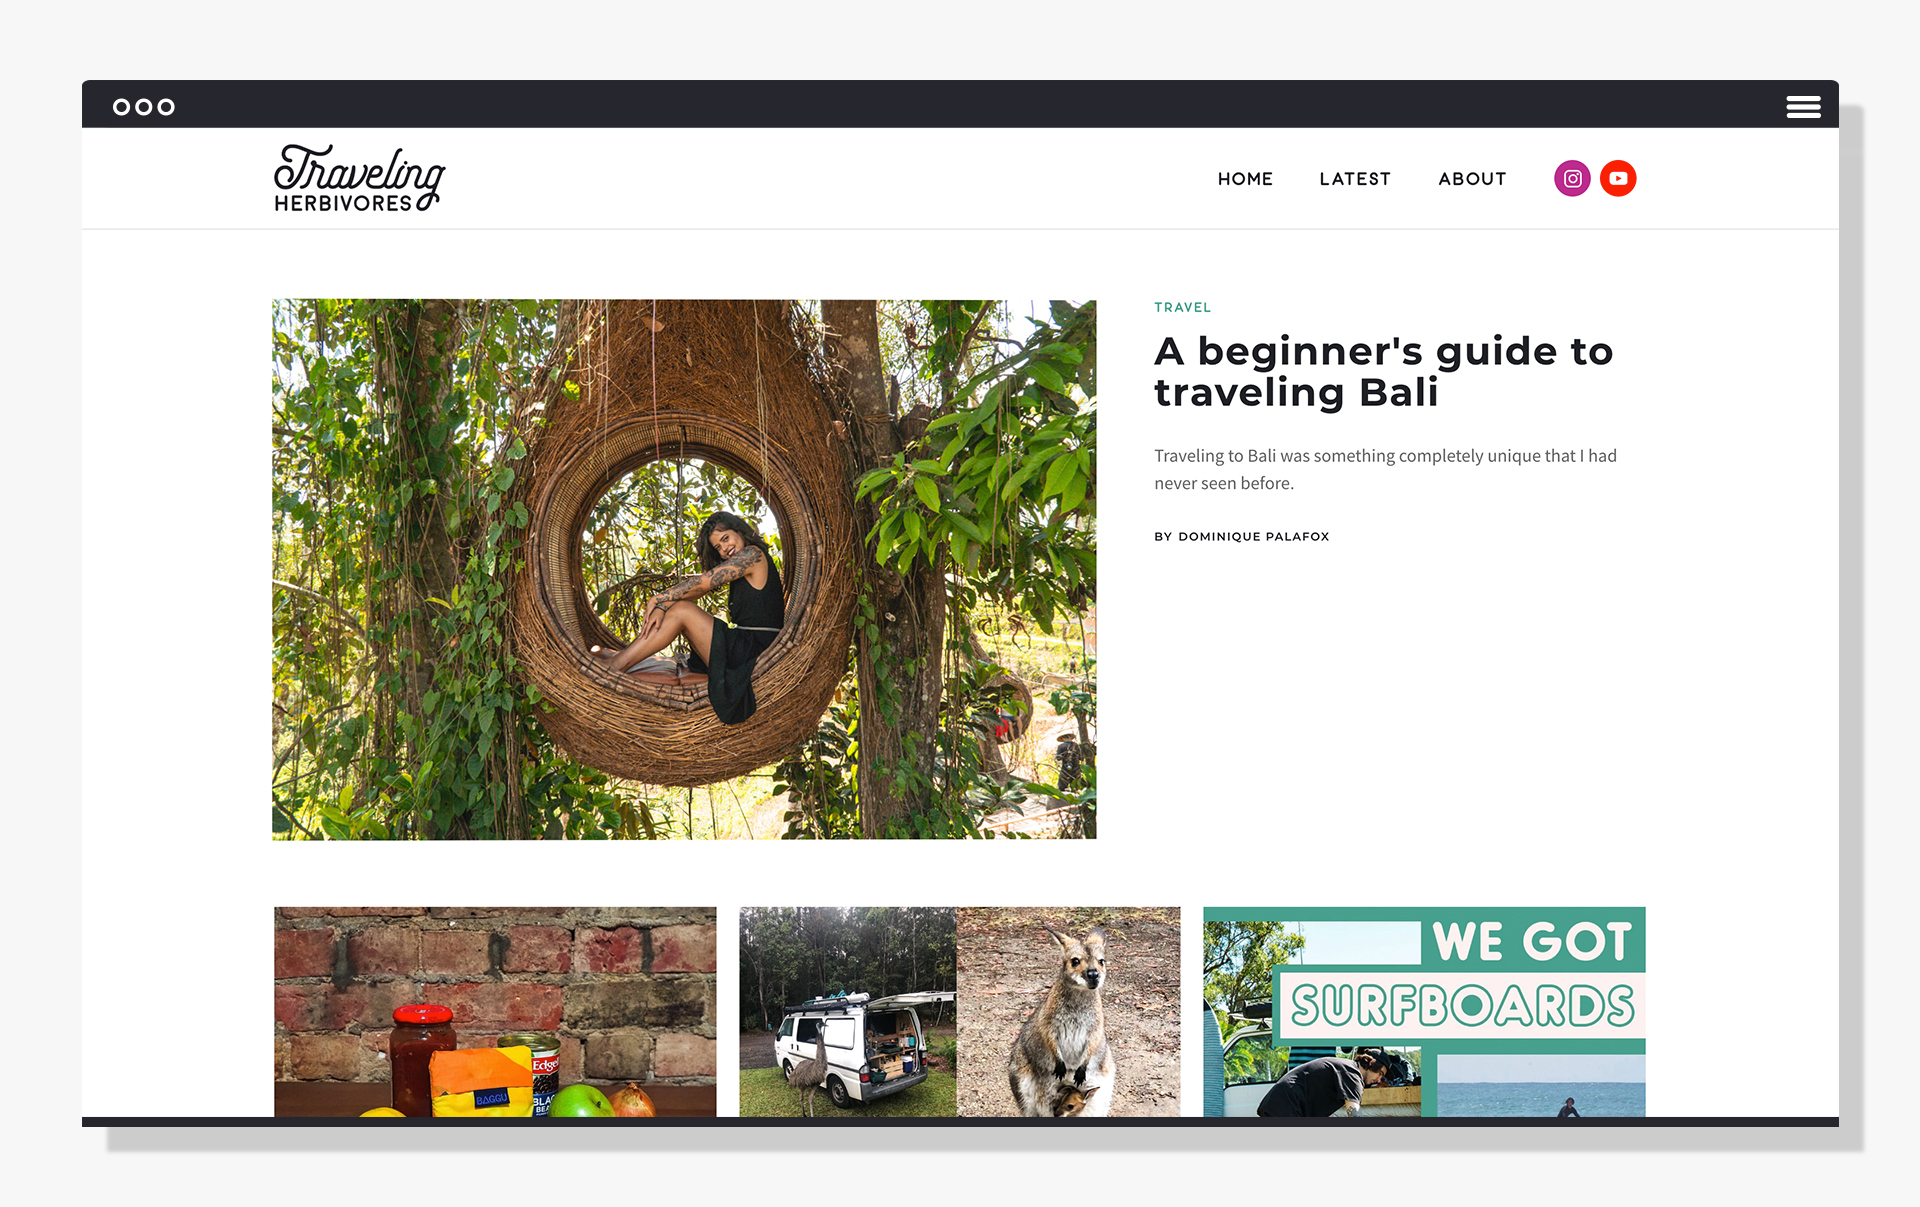 Website designed and developed using Webflow